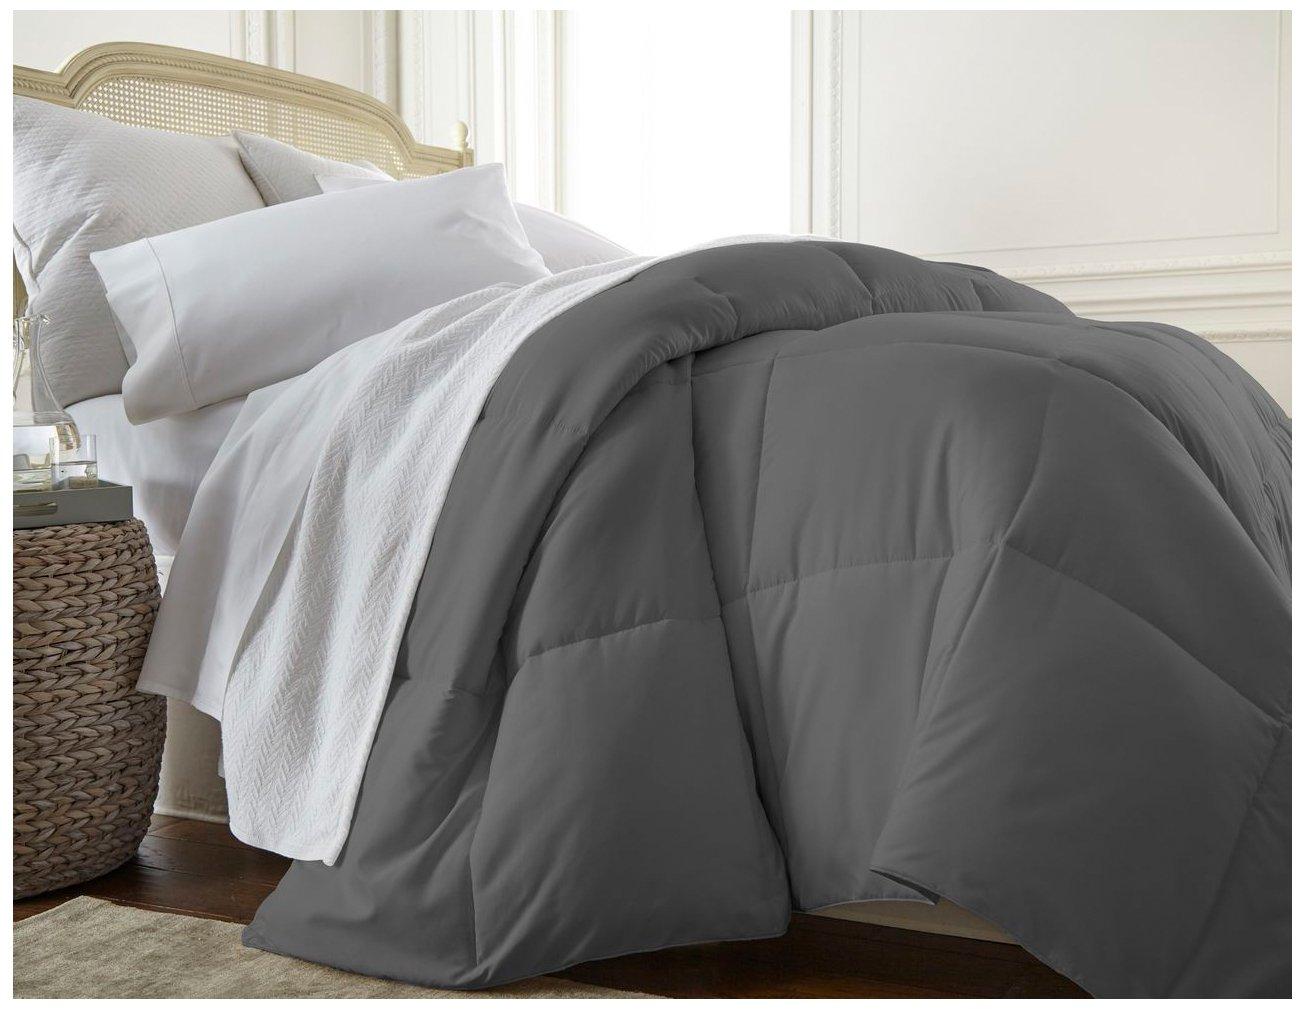 Simply Soft Comforter, King/California King, Gray